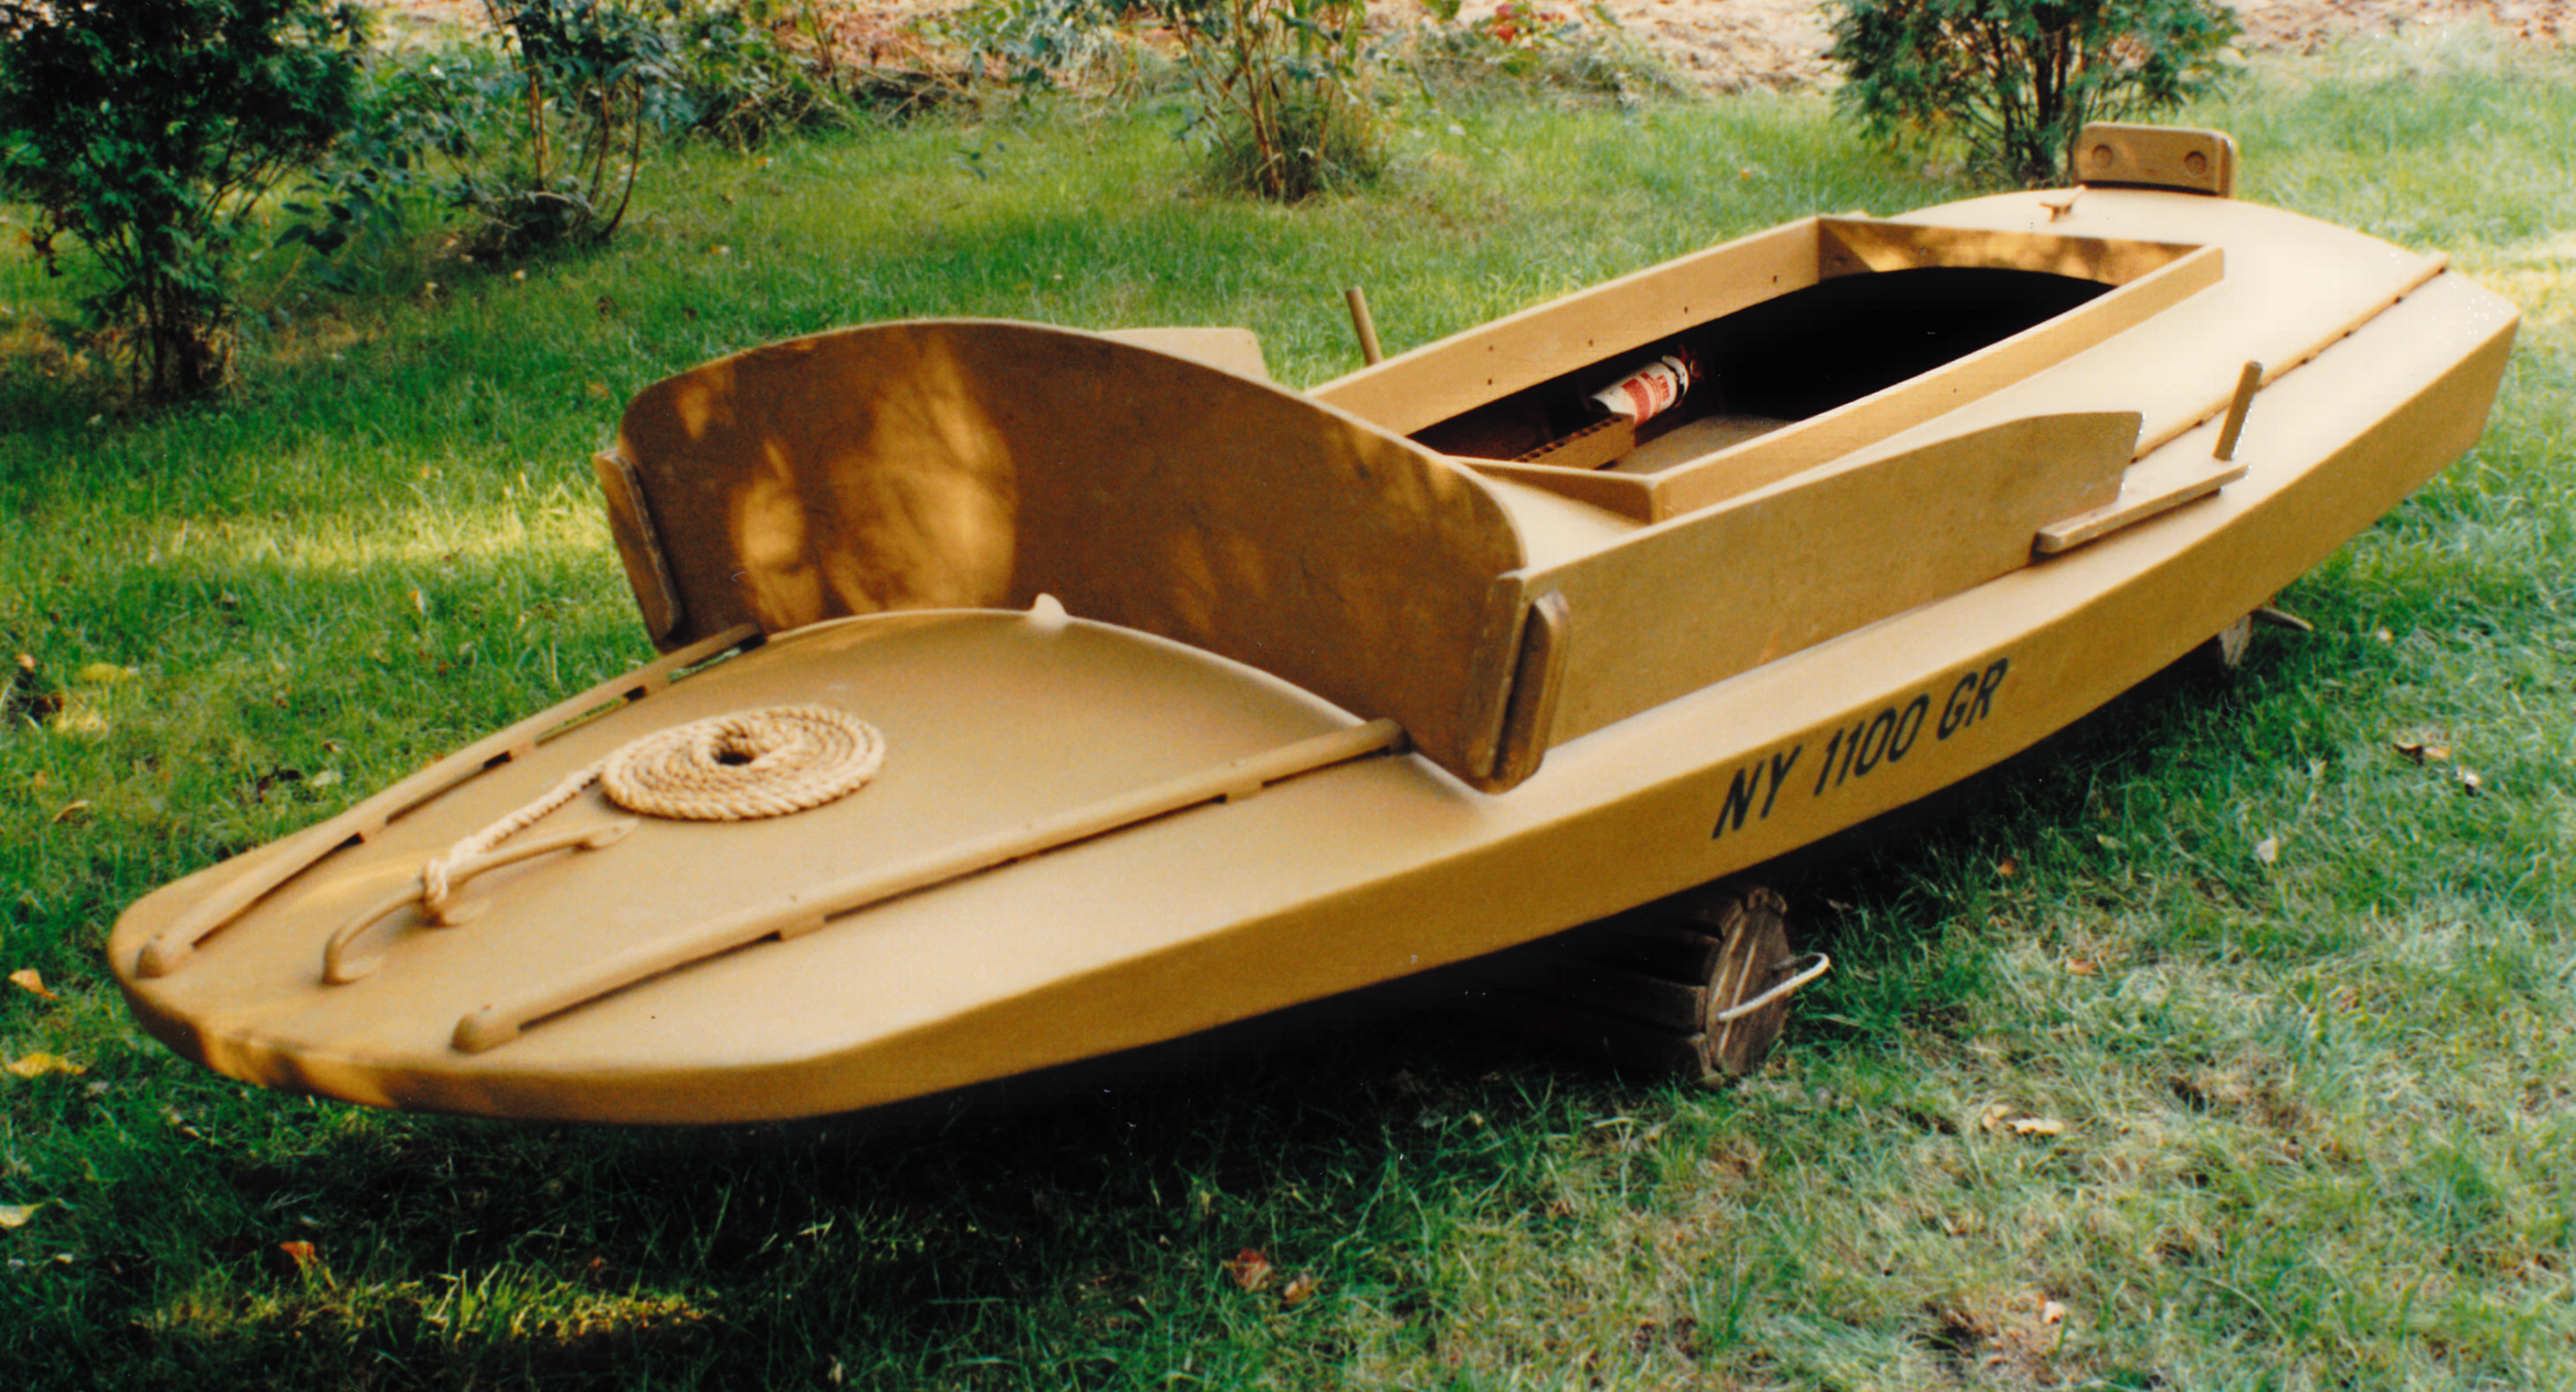 One-man Grassboat | Steven Jay Sanford